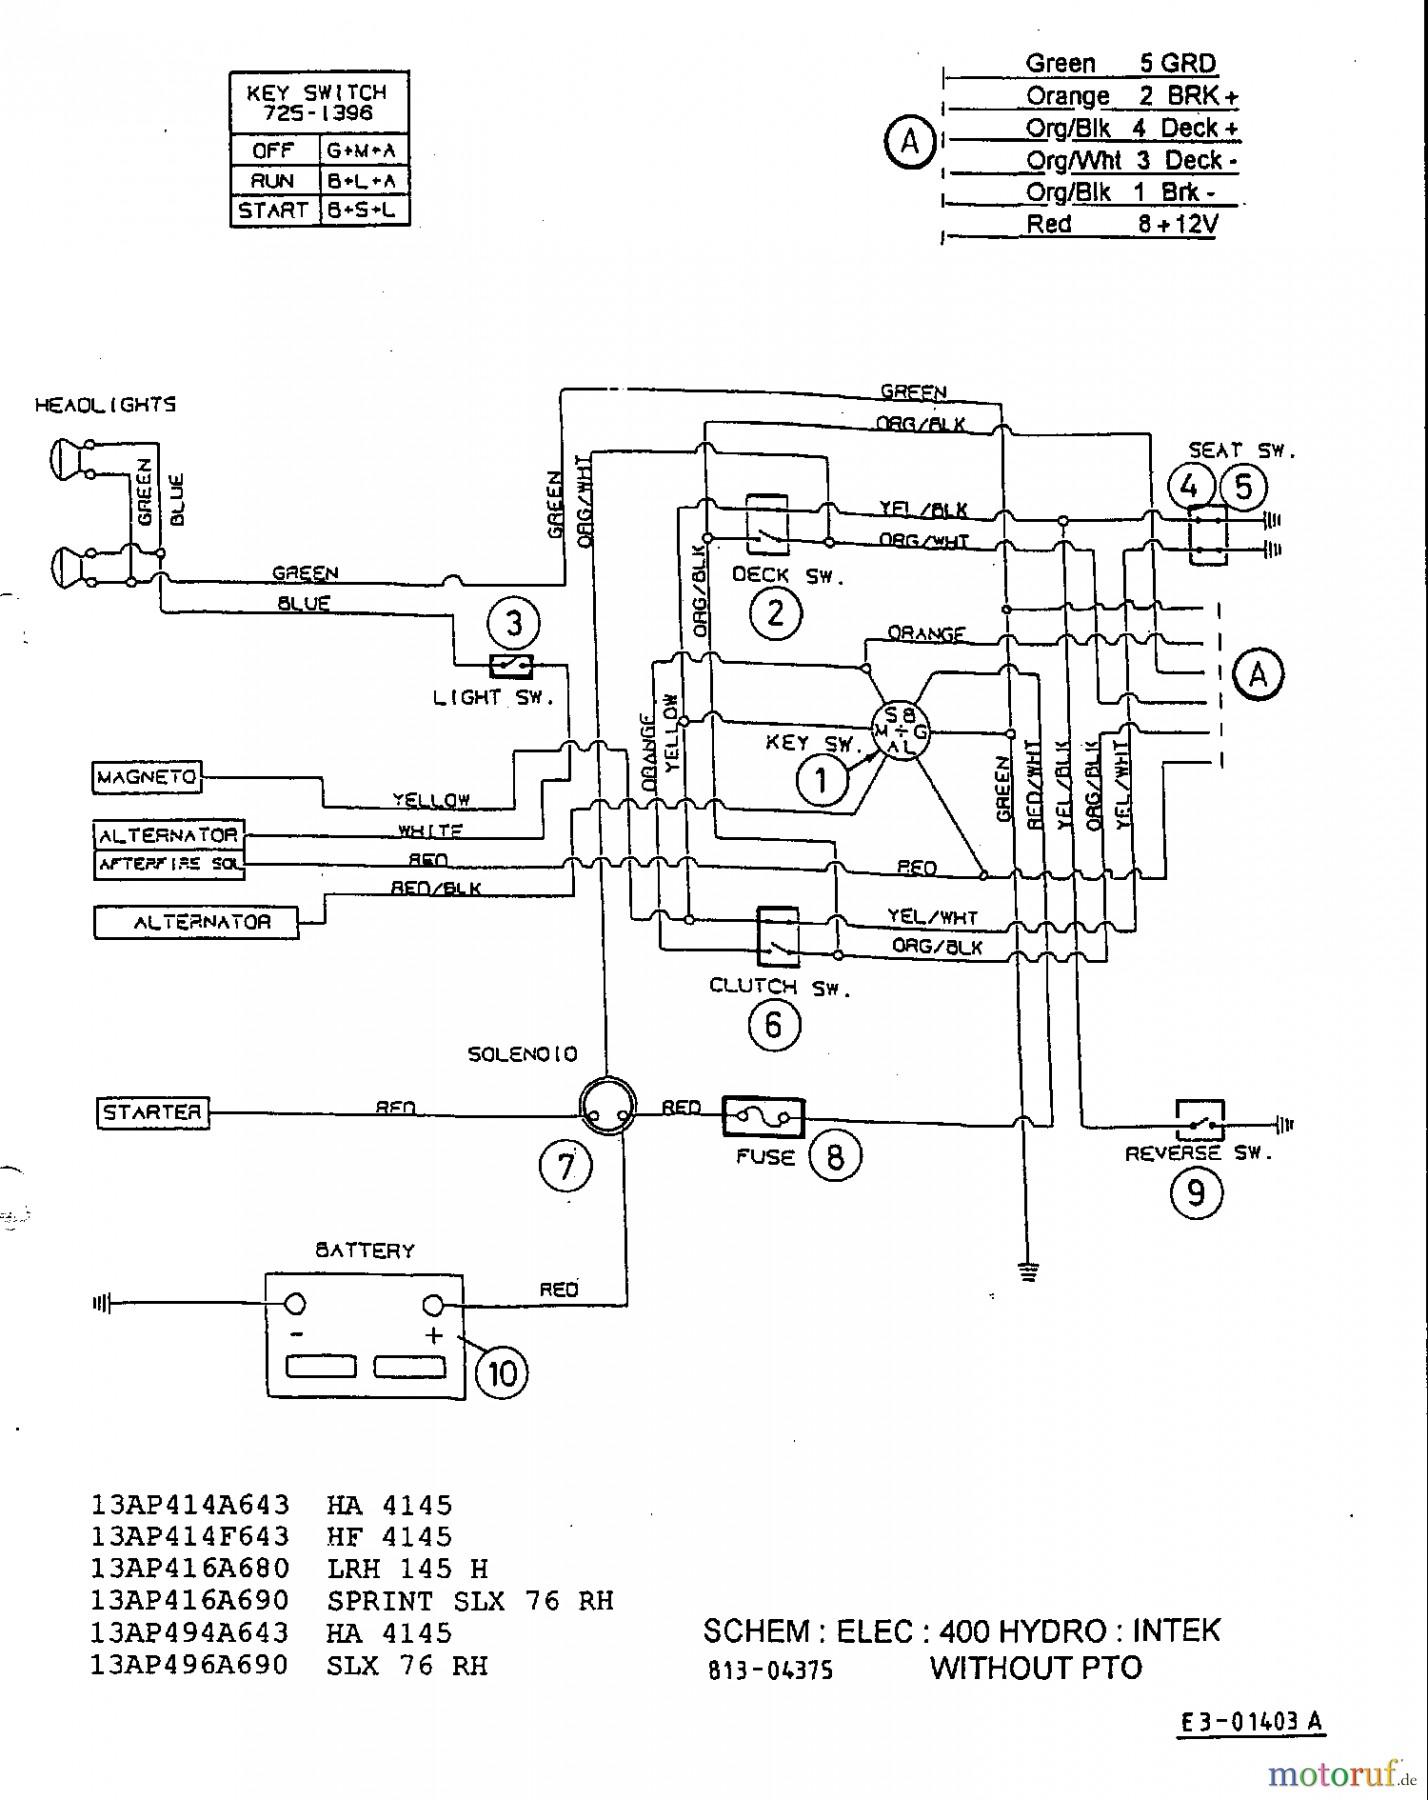 Diagram Of Lawn Mower Engine Mtd Riding Mower Wiring Diagram with Yard Machine Of Diagram Of Lawn Mower Engine